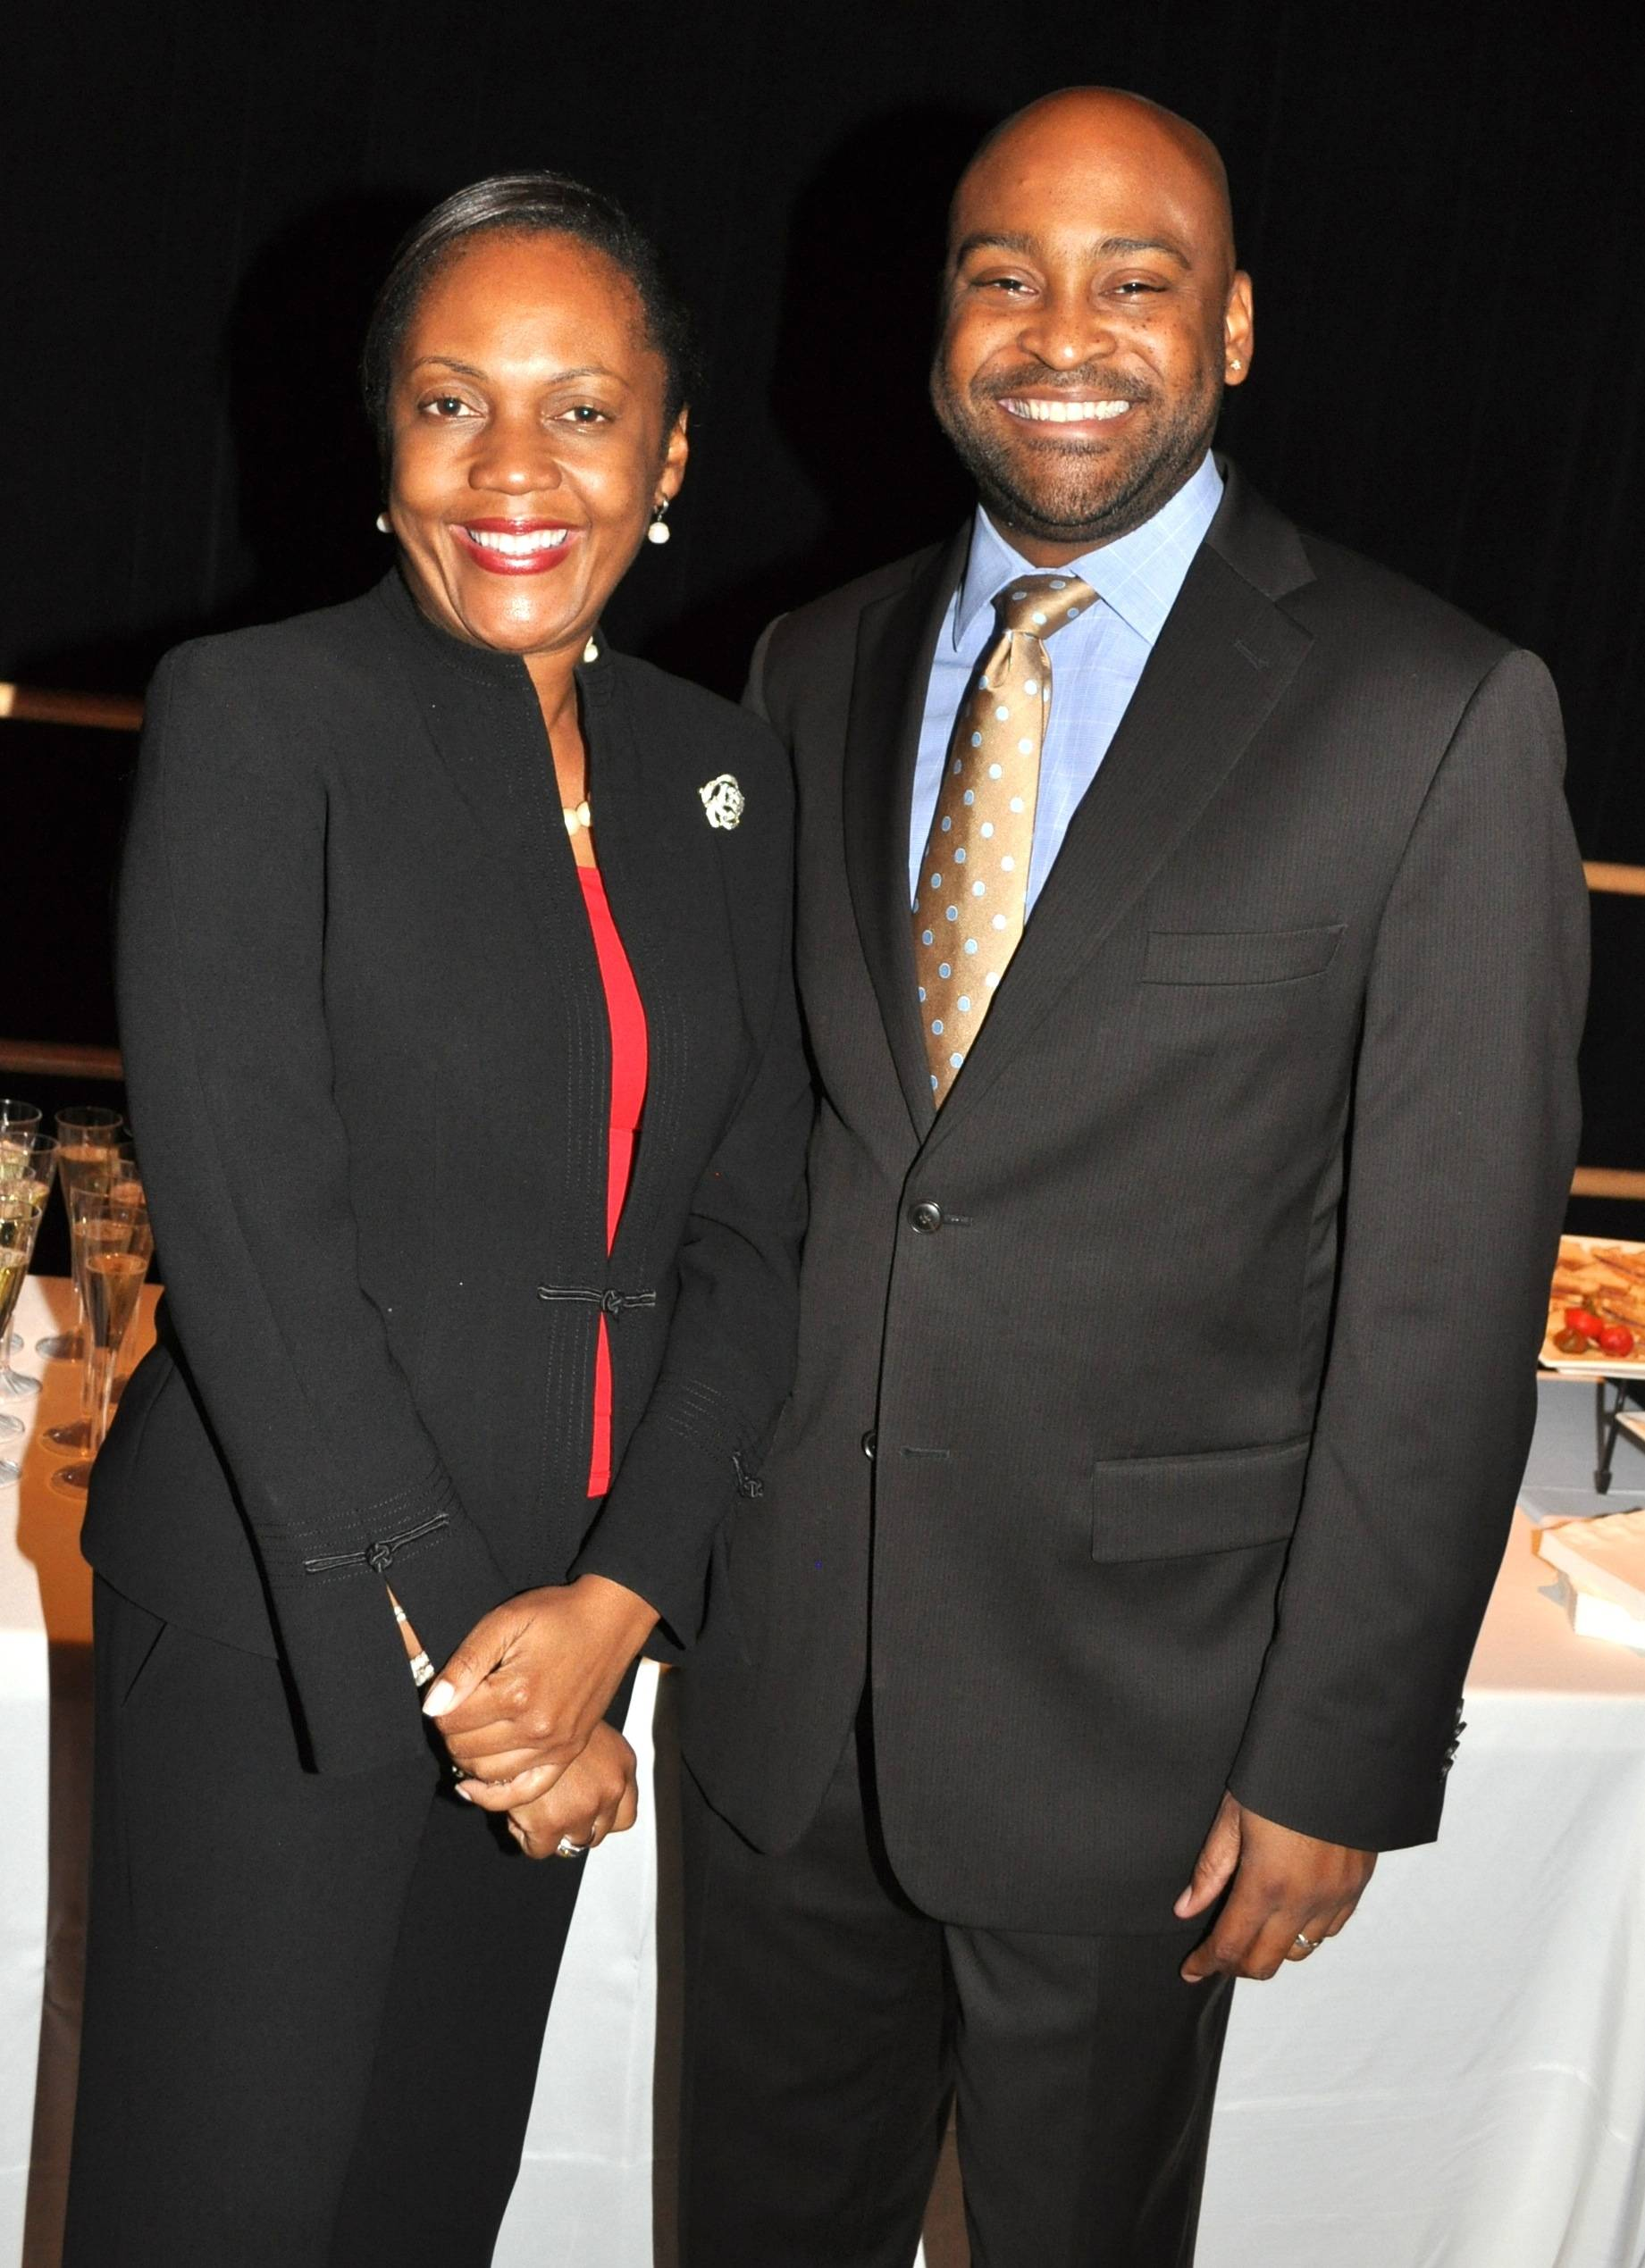 10) Valerie Riles and Senator Oscar Braynon